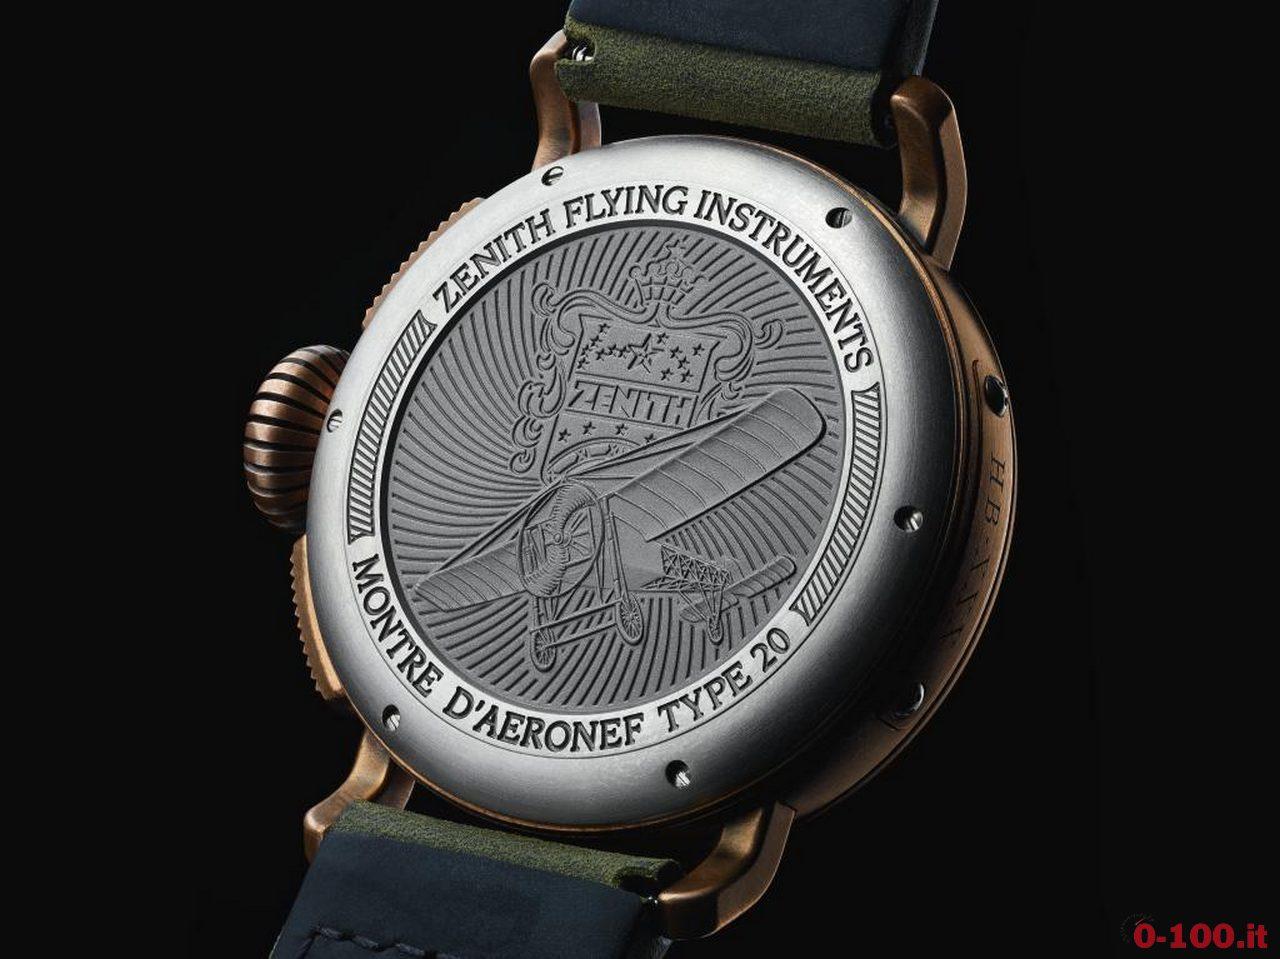 anteprima-baselworld-2017-heritage-collection-zenith-pilot-extra-special-chronograph-ref-9-2430-4069-21-c800-prezzo-price_0-1004